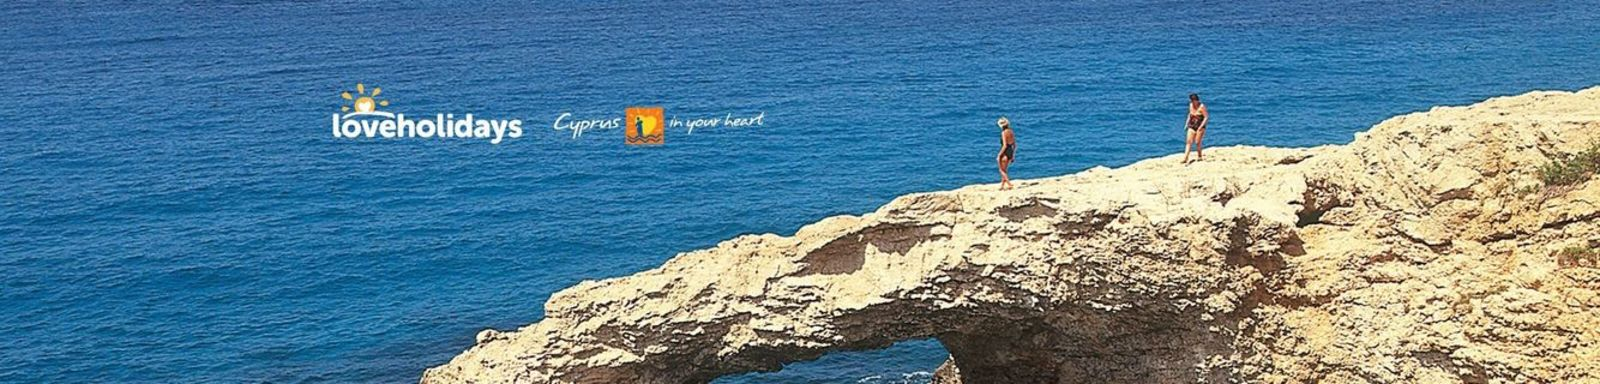 cyprus-header